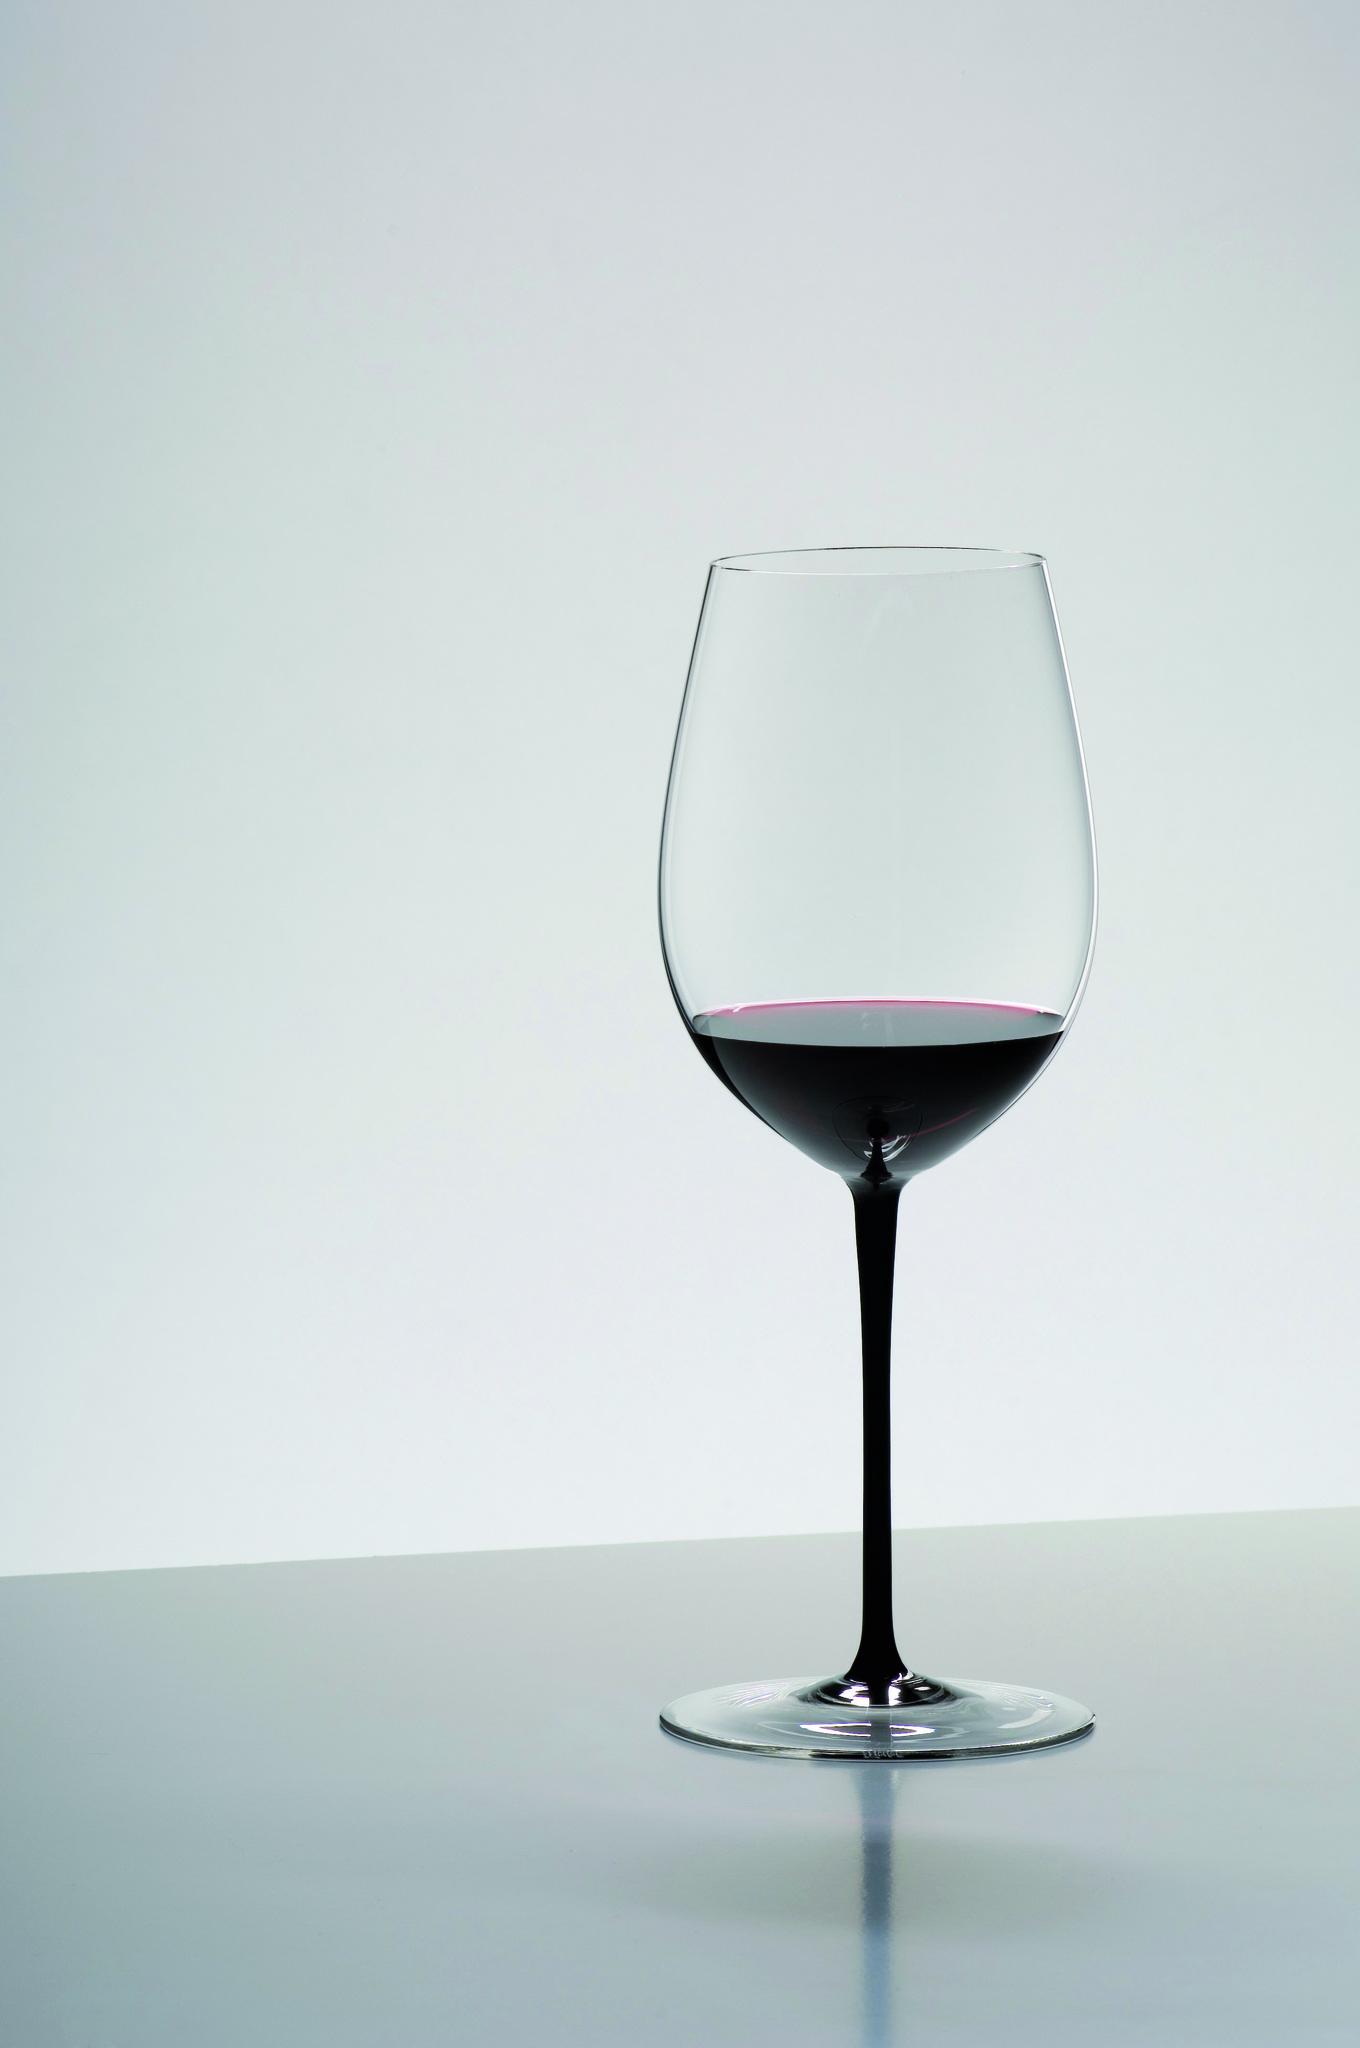 Бокалы Бокал для красного вина 860мл Riedel Sommeliers Black Tie Bordeaux Grand Cru bokal-dlya-krasnogo-vina-860-ml-riedel-bordeaux-grand-cru-black-tie-avstriya.jpg